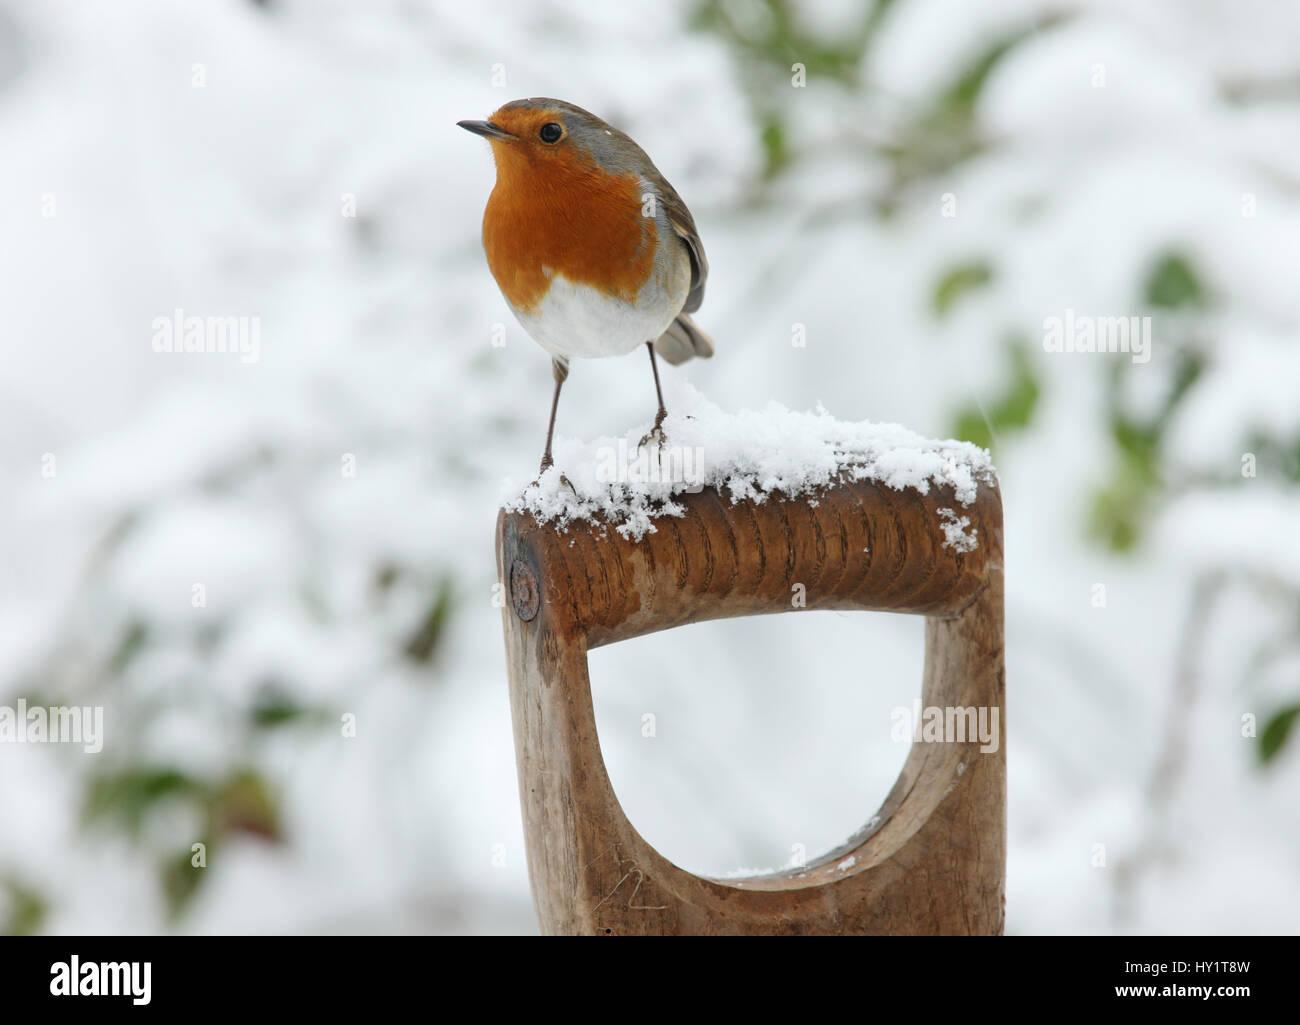 European Robin (Erithacus rubecula) male on a snowy fork handle. Surrey, UK, January. - Stock Image